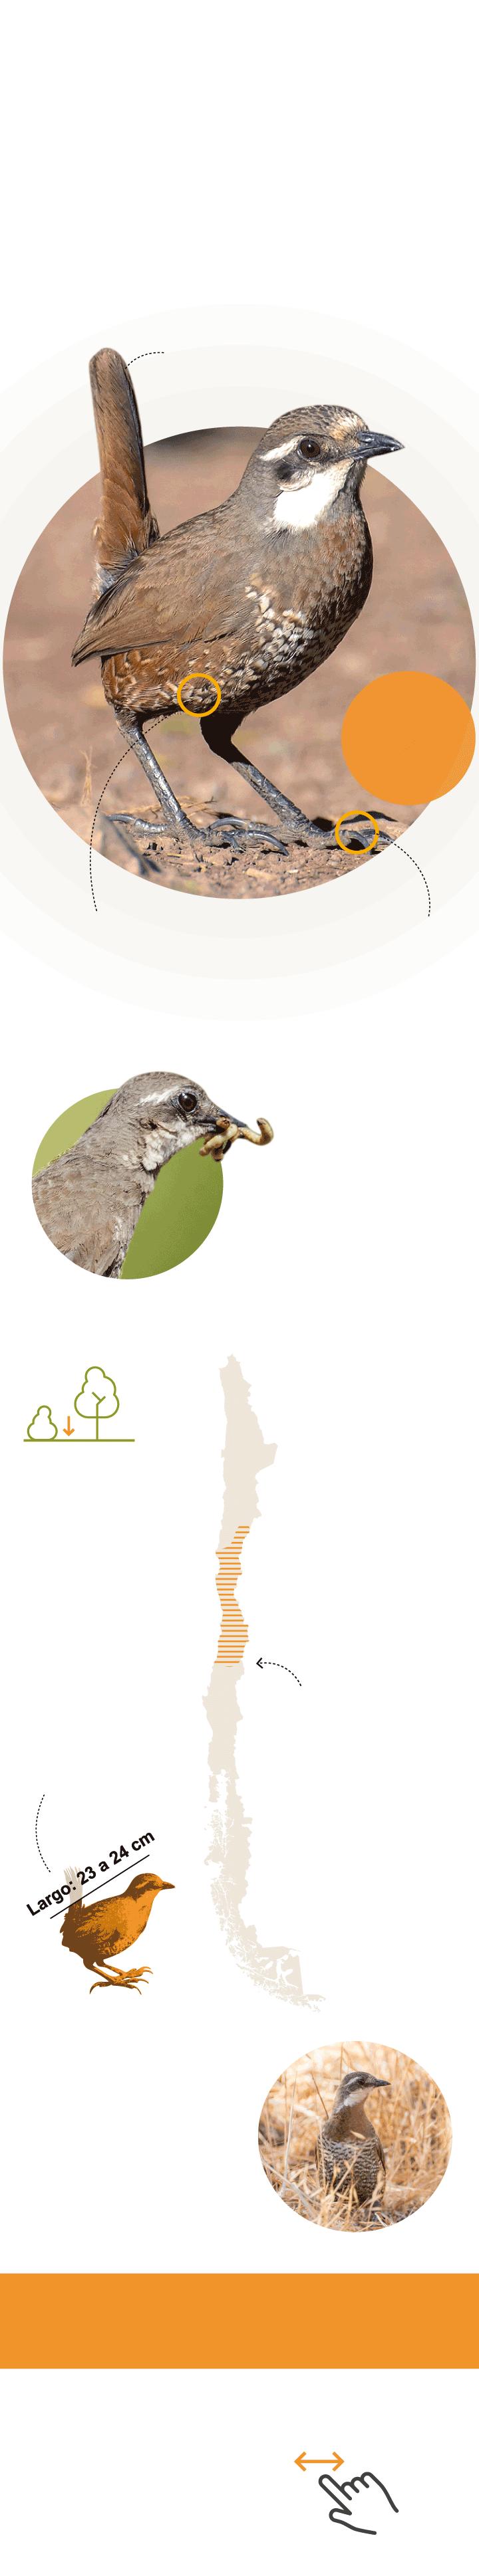 A Vuelo De Pajaro Con Imagenes Aves De Chile